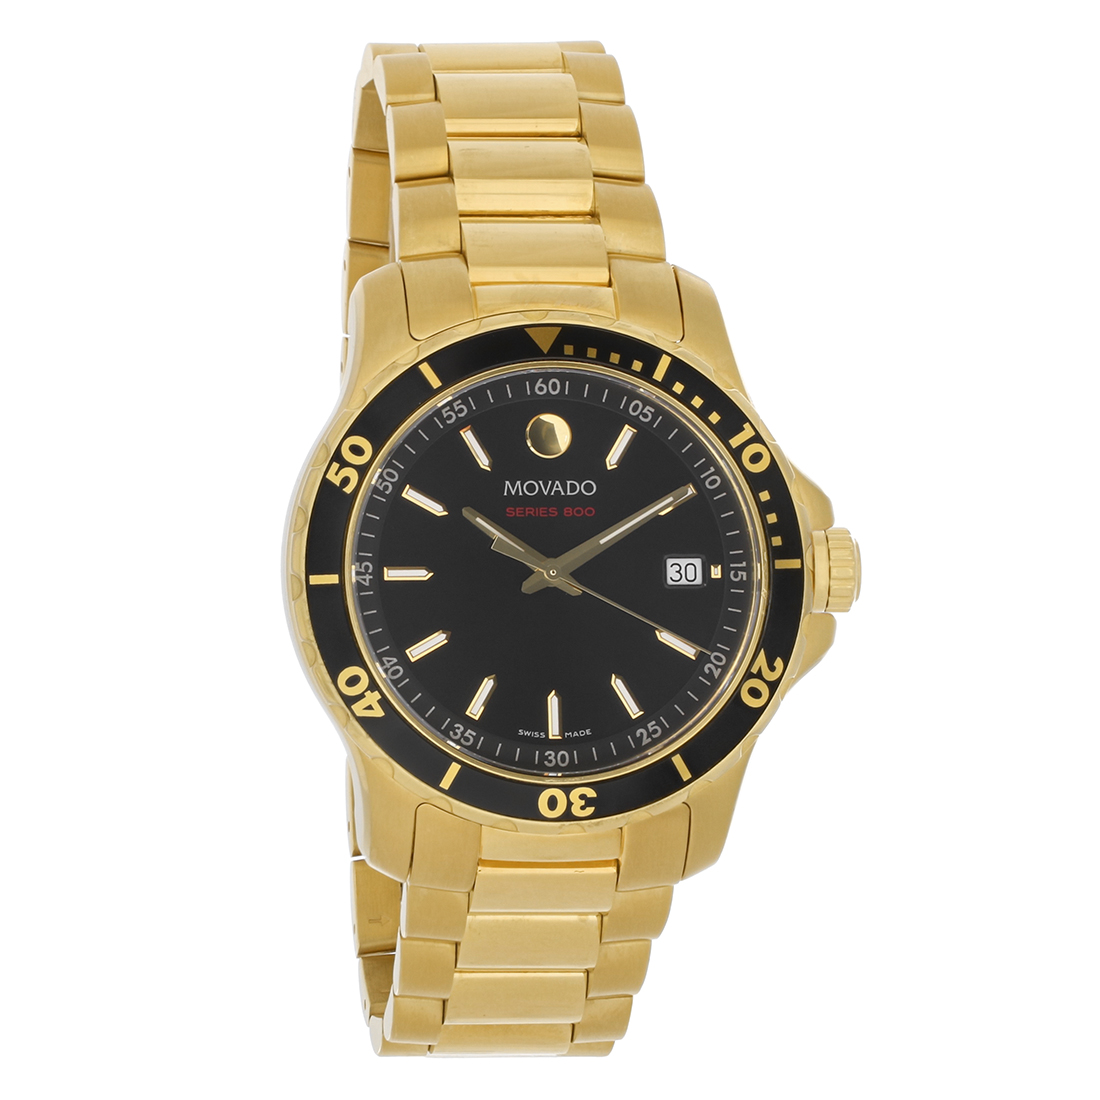 015df3349a6 Movado Series 800 Mens Black Dial Stainless Steel Swiss Quartz Watch 2600145